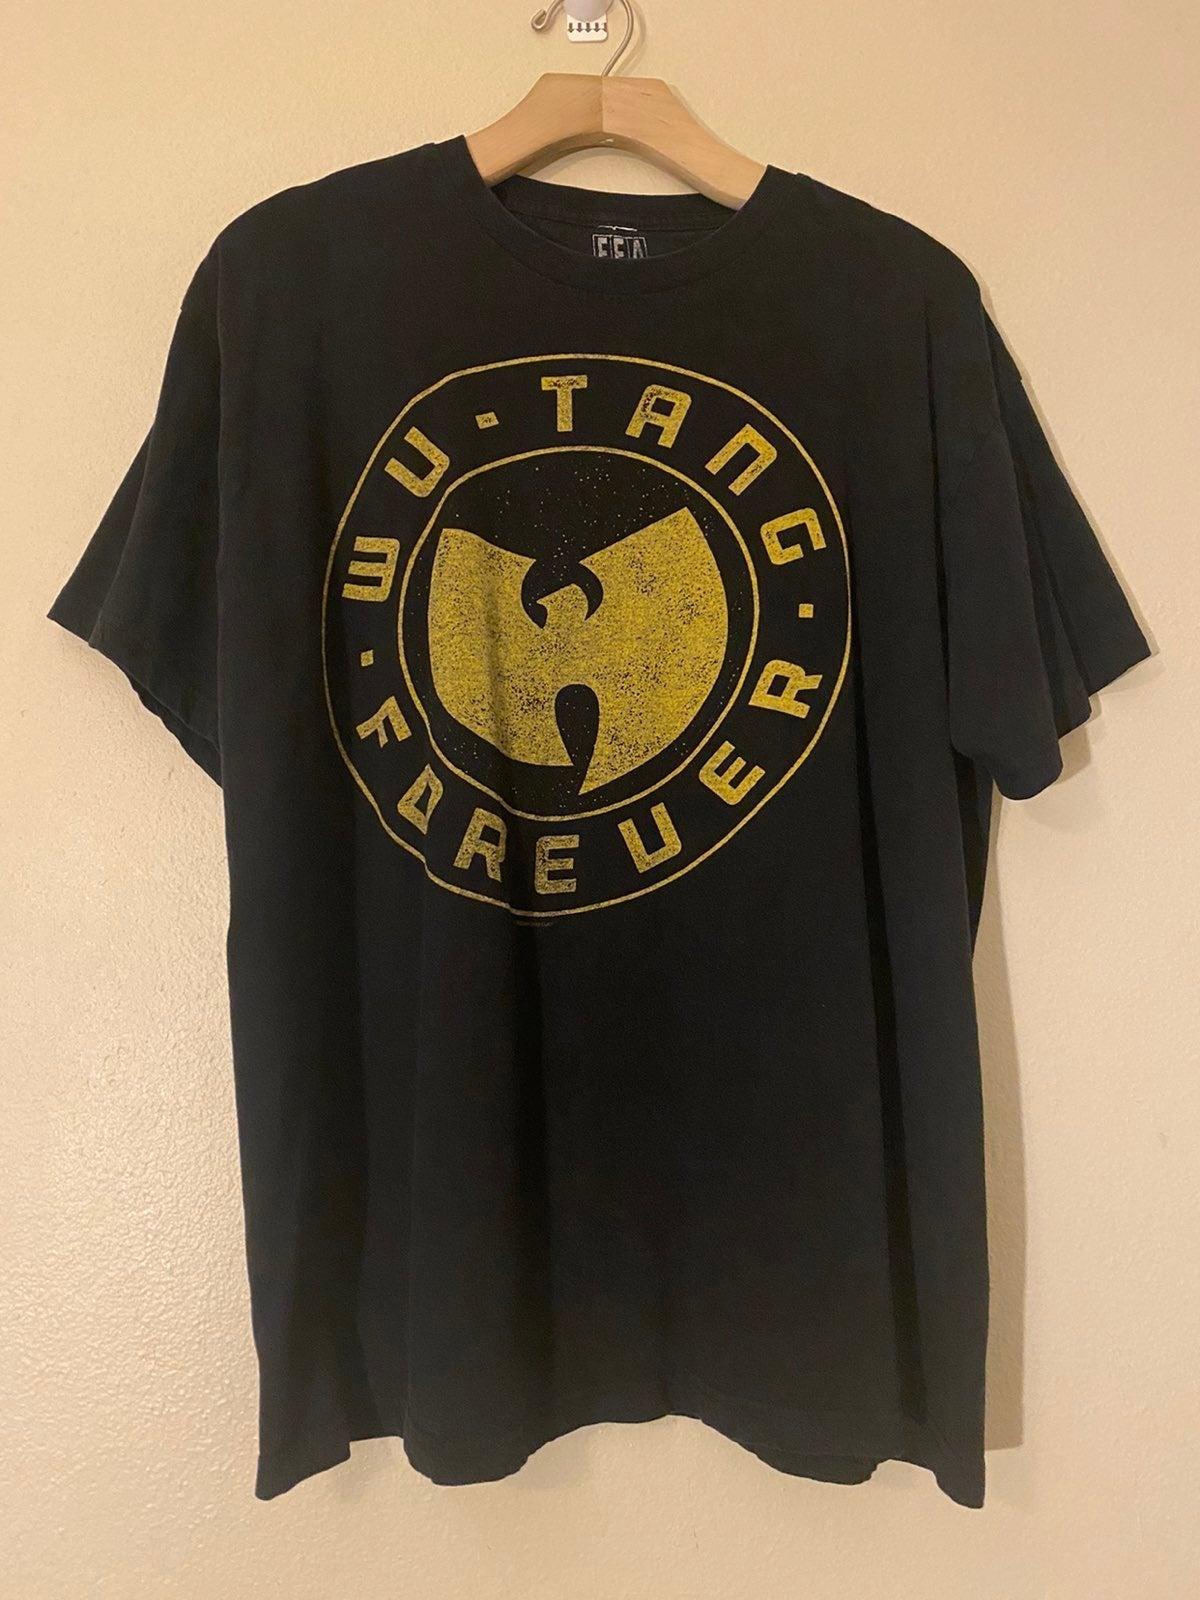 Wu Tang Clan Rap tee 2000s